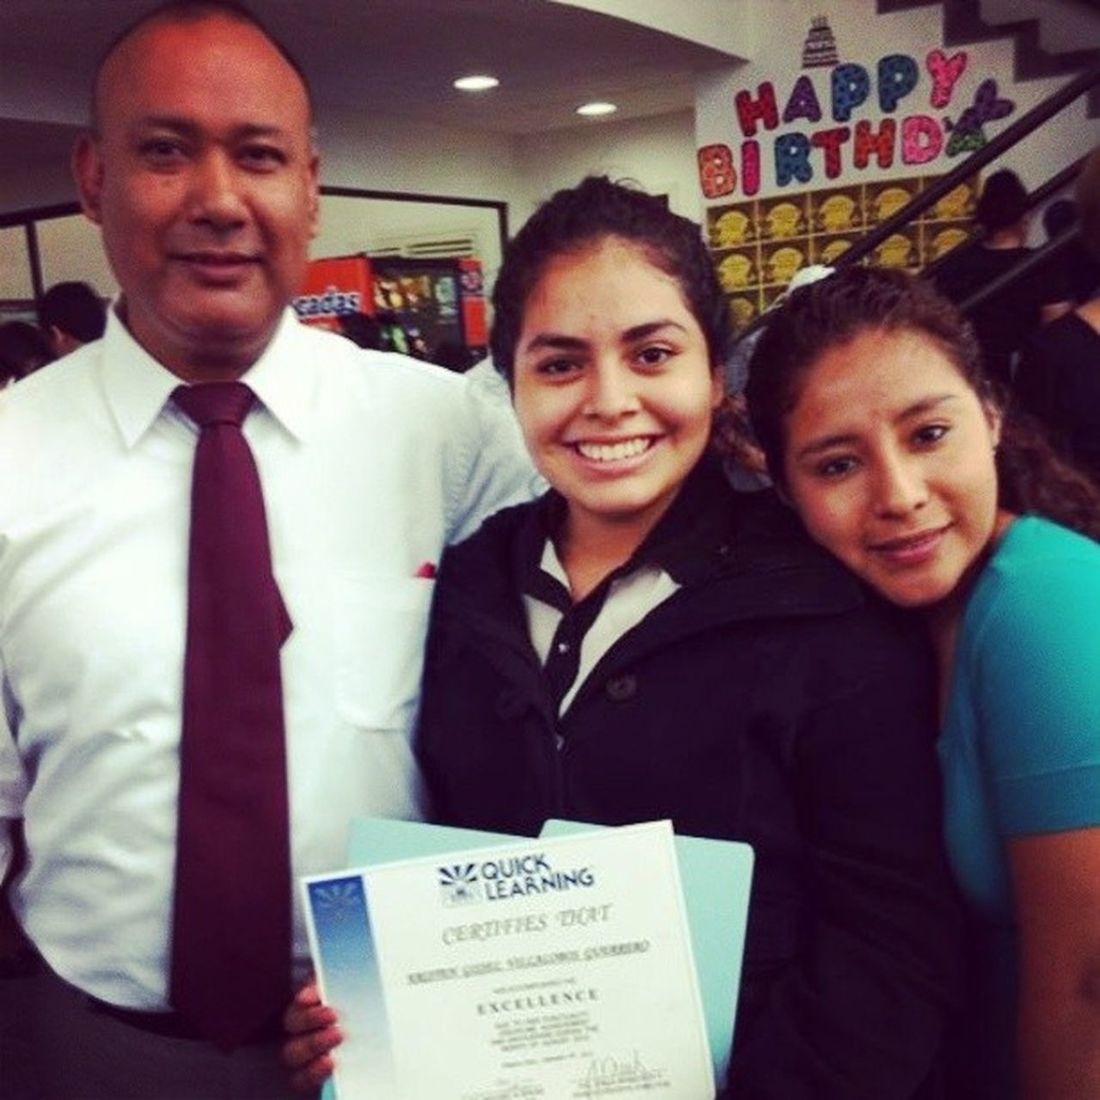 Teacher Friend QuickLearning Diploma Intelligent Happy Saturday Instacool